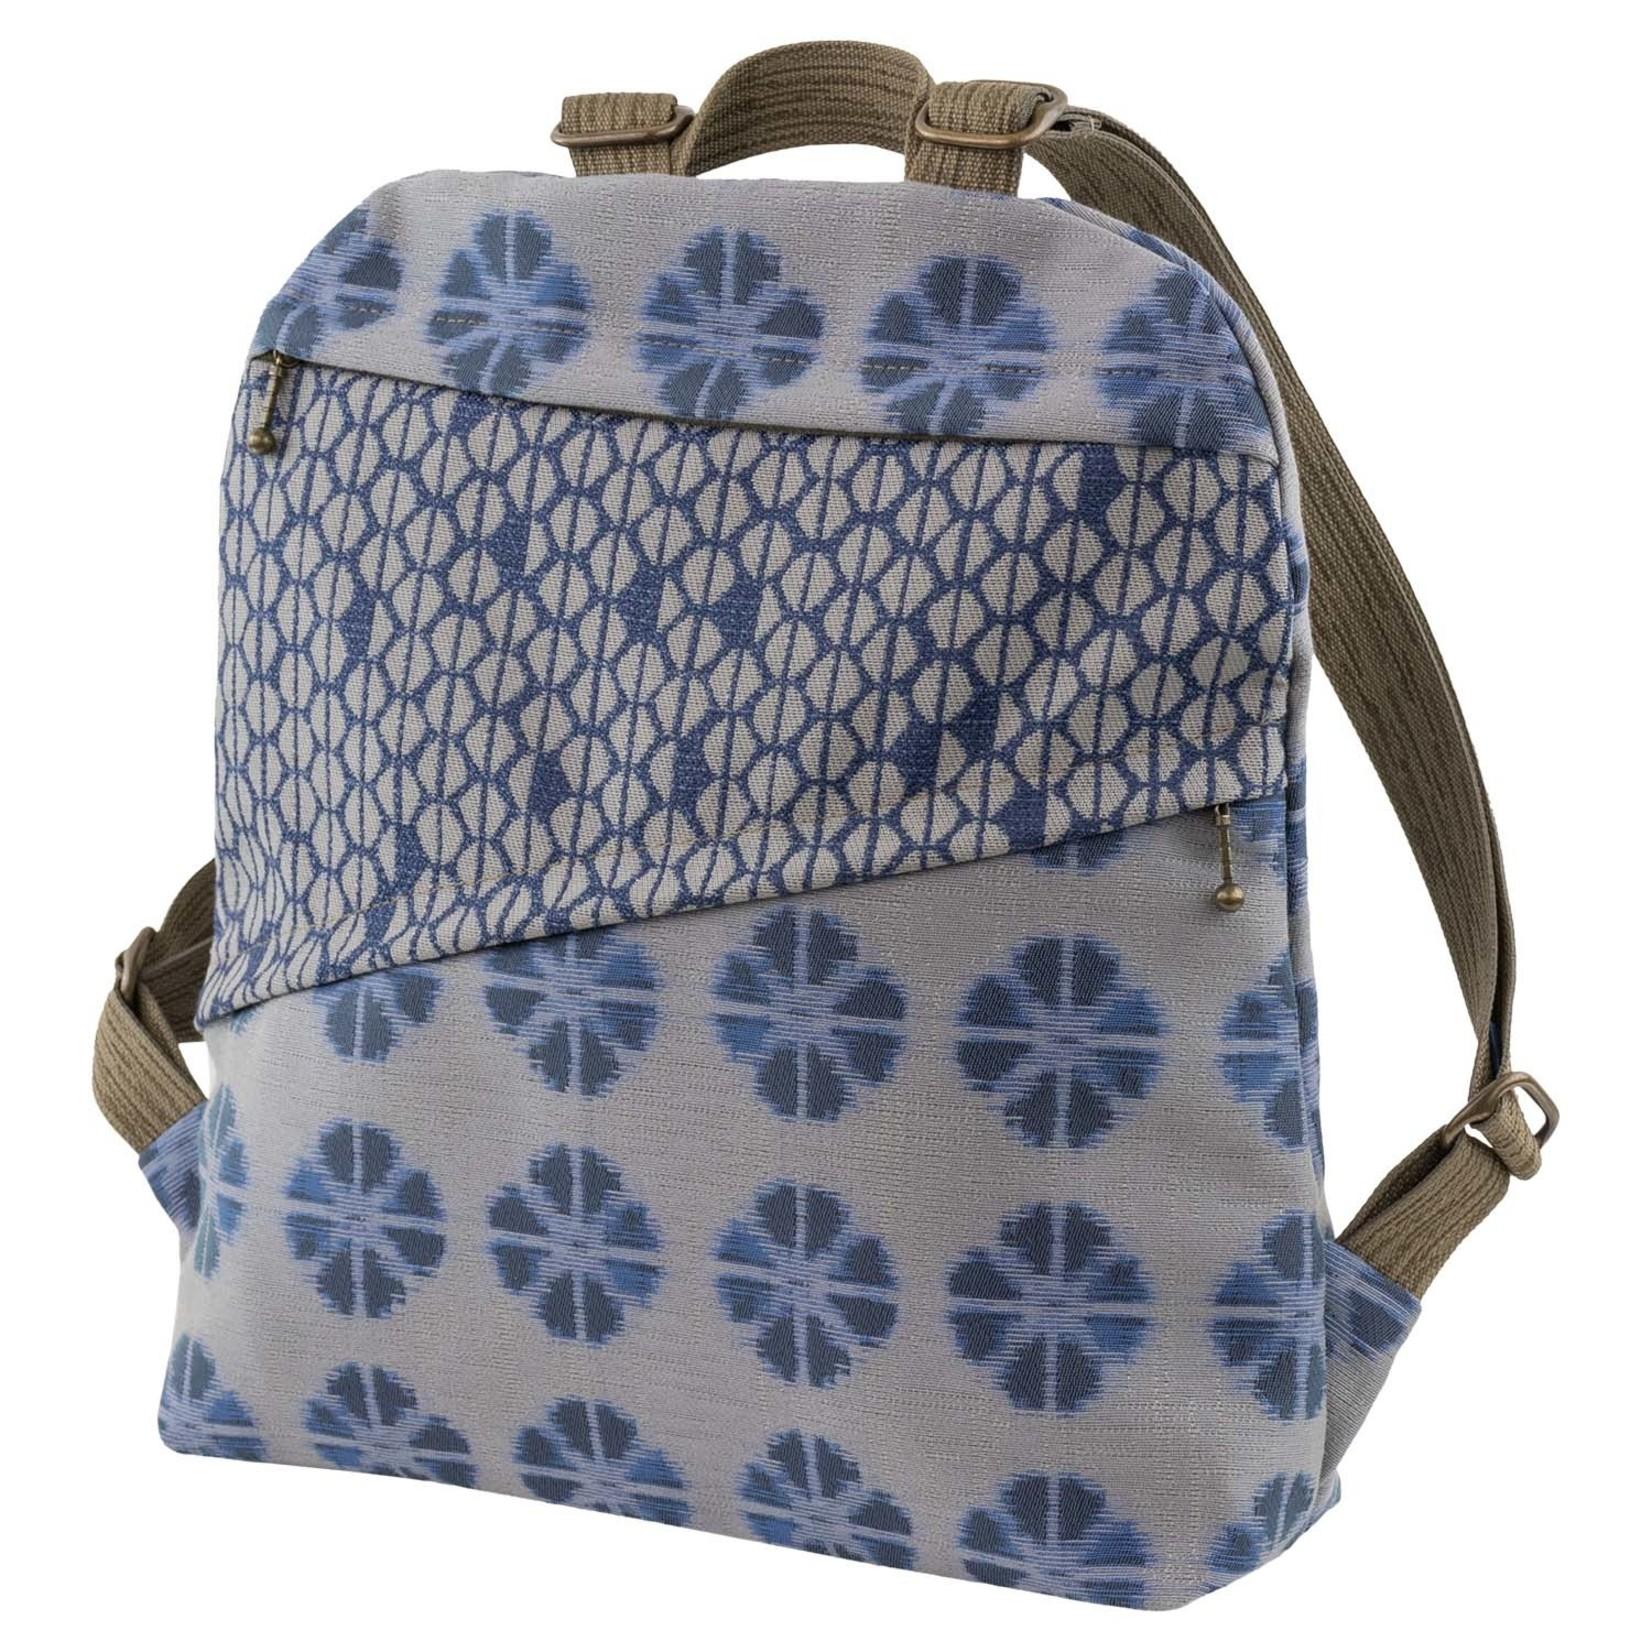 Maruca Lady Bird Pack SS21 Kyoto Blue